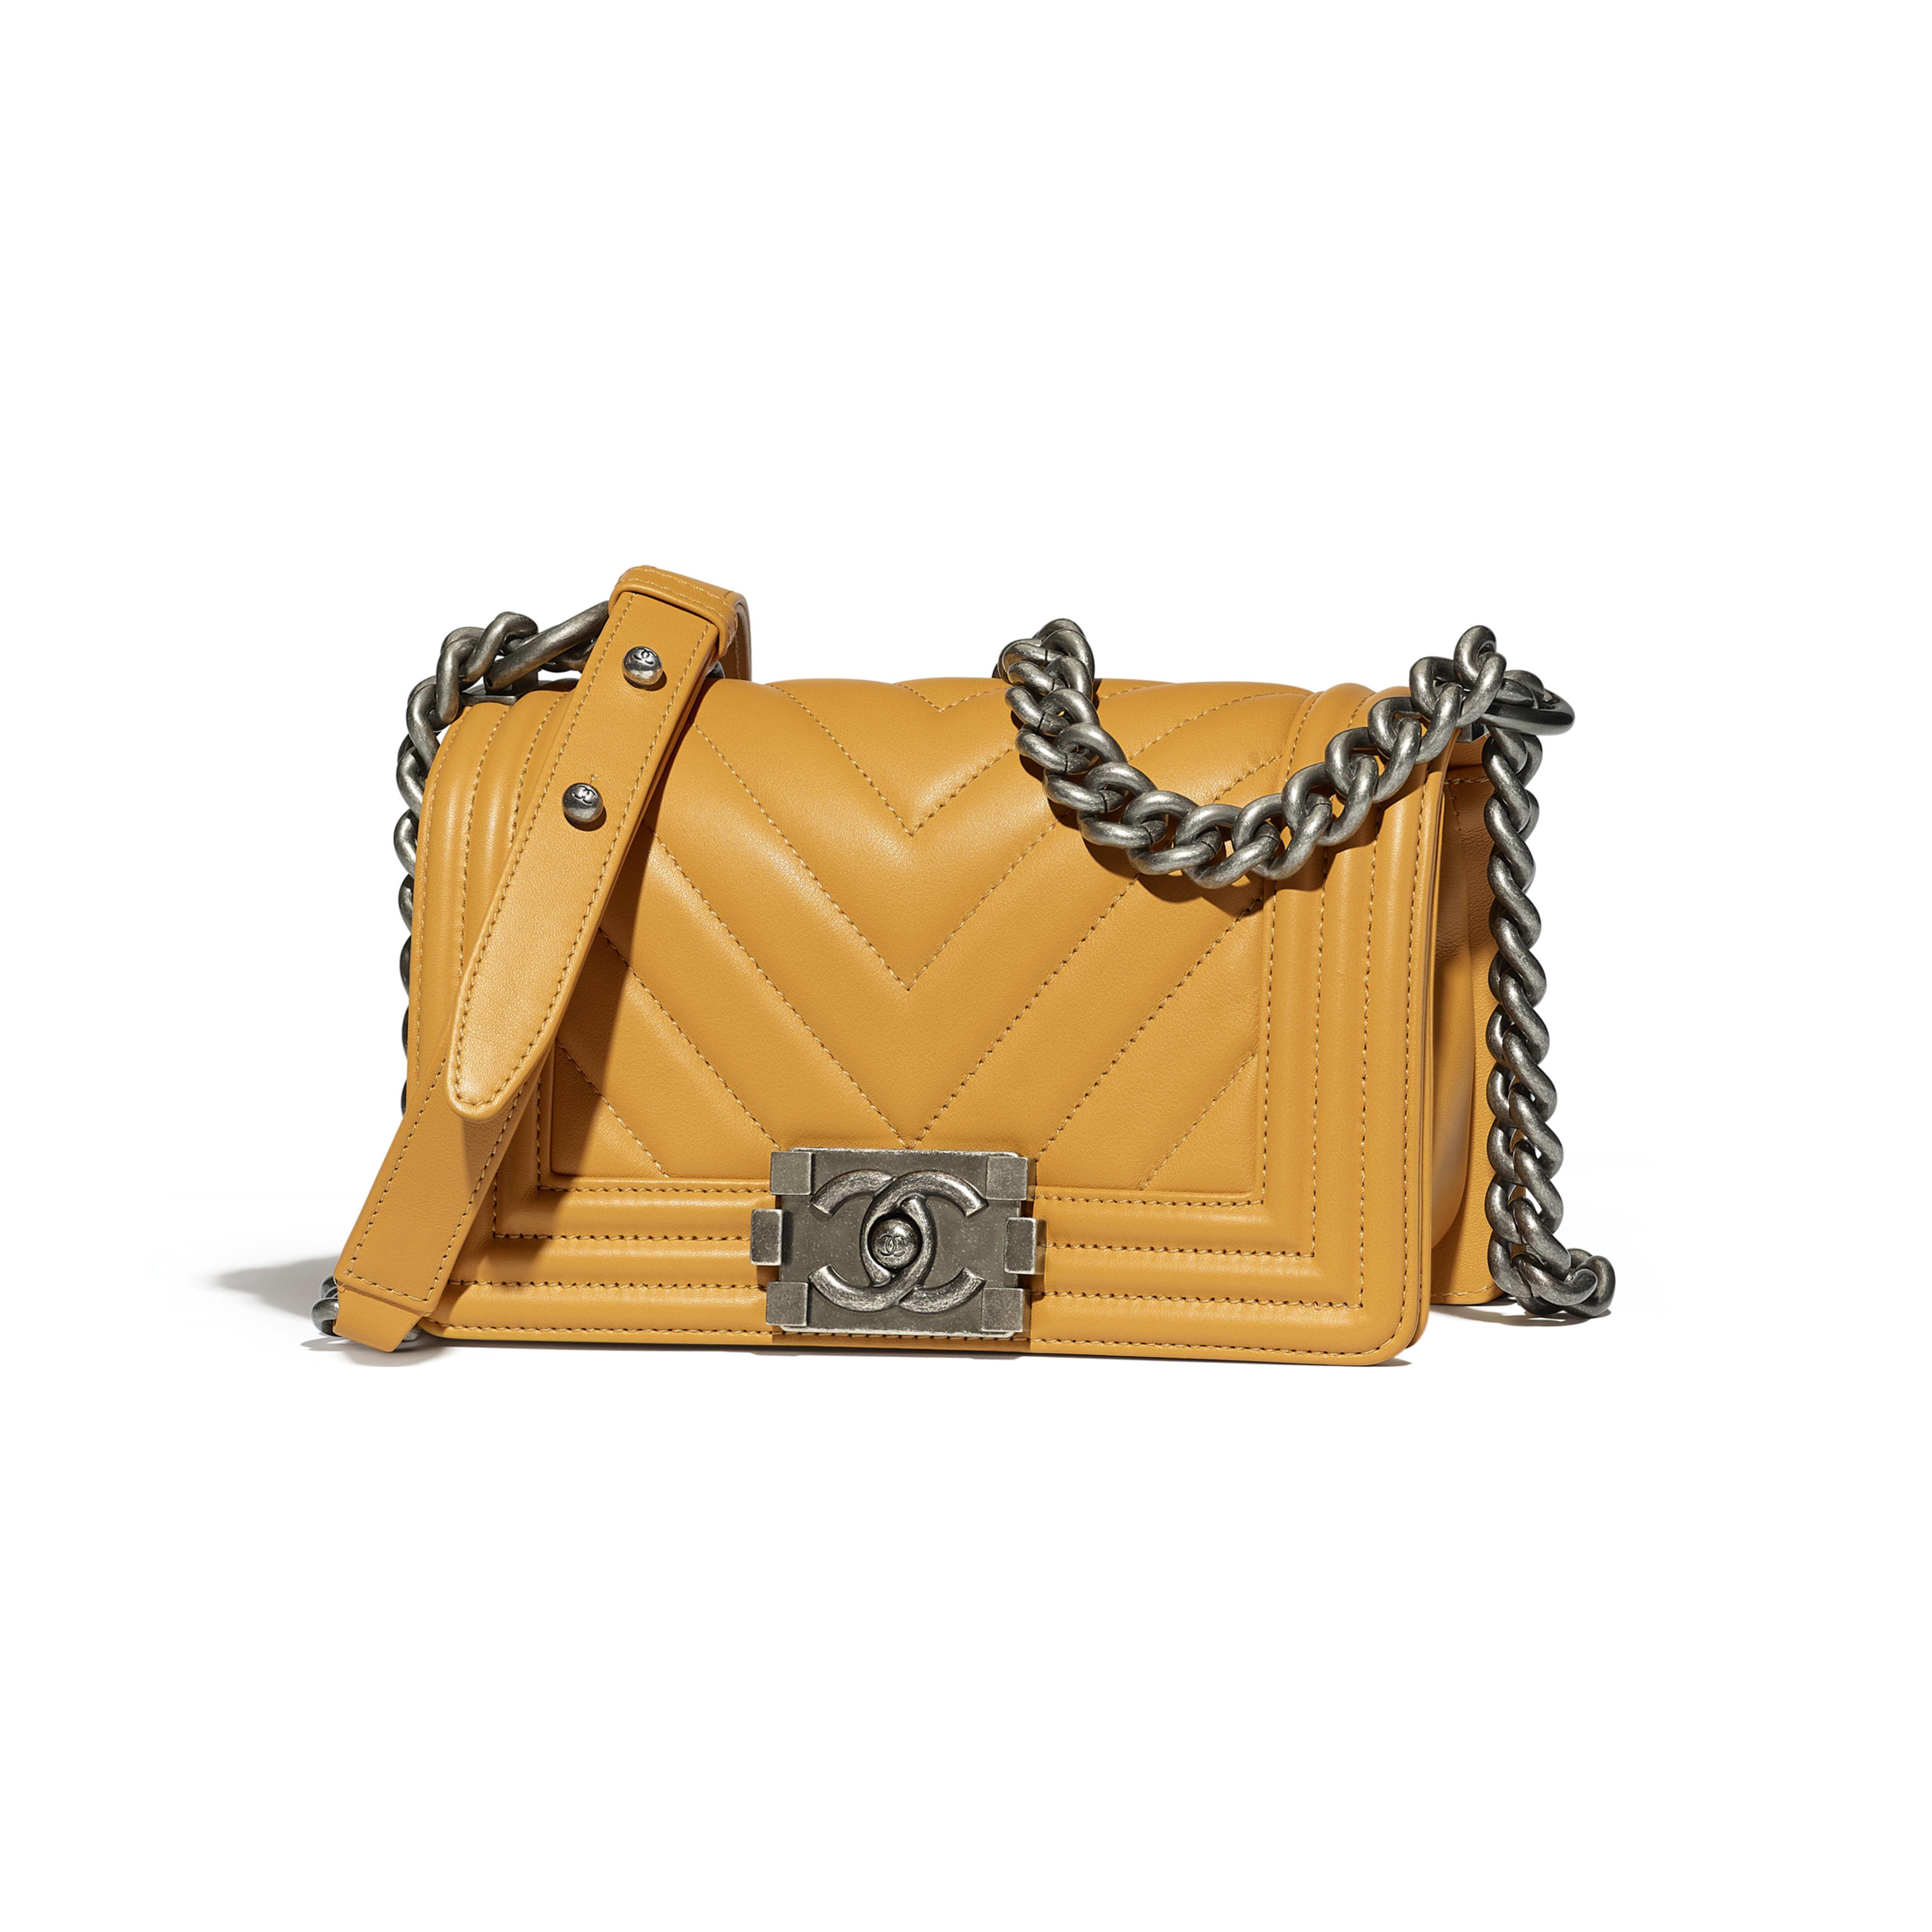 Small BOY CHANEL Handbag Calfskin & Ruthenium-Finish Metal Yellow -                                  view 1 - see full sized version